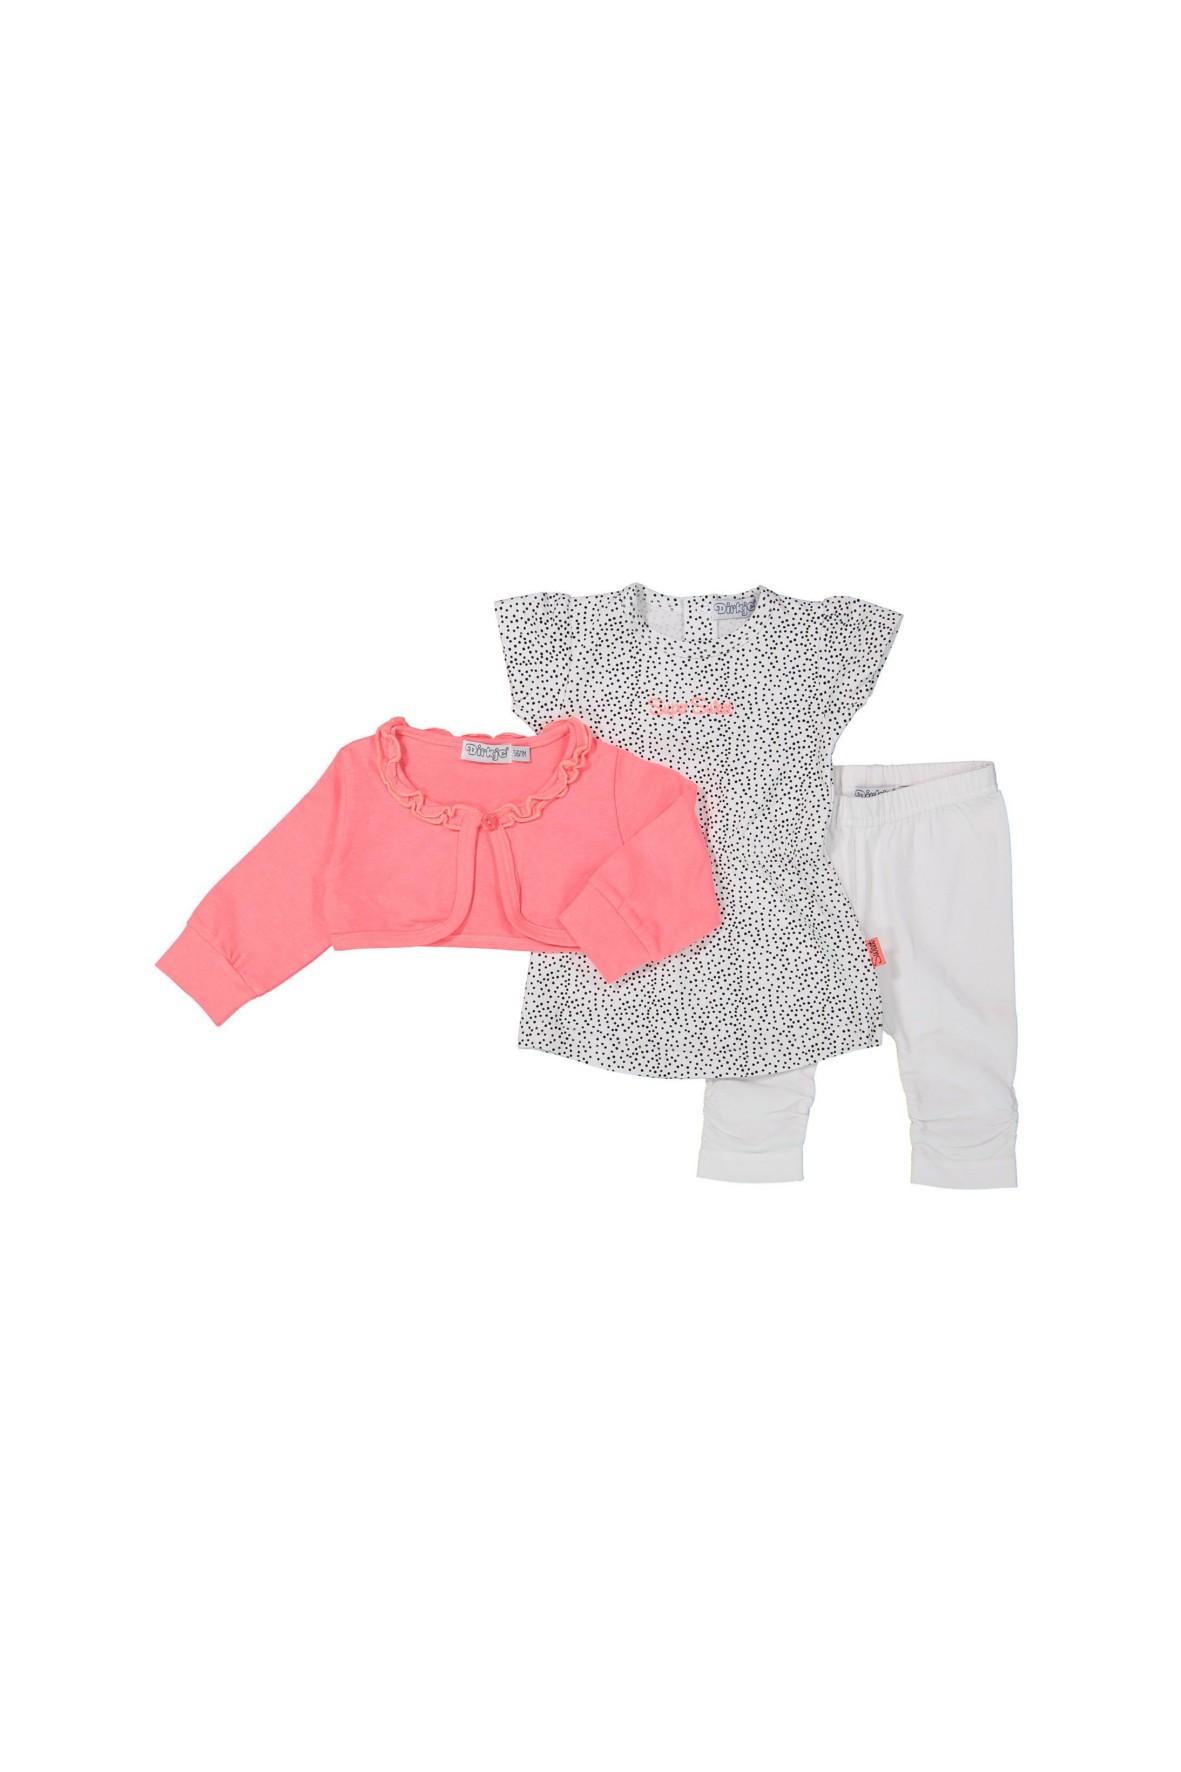 Komplet ubrań dla niemowlaka bolerko tunika i leginsy